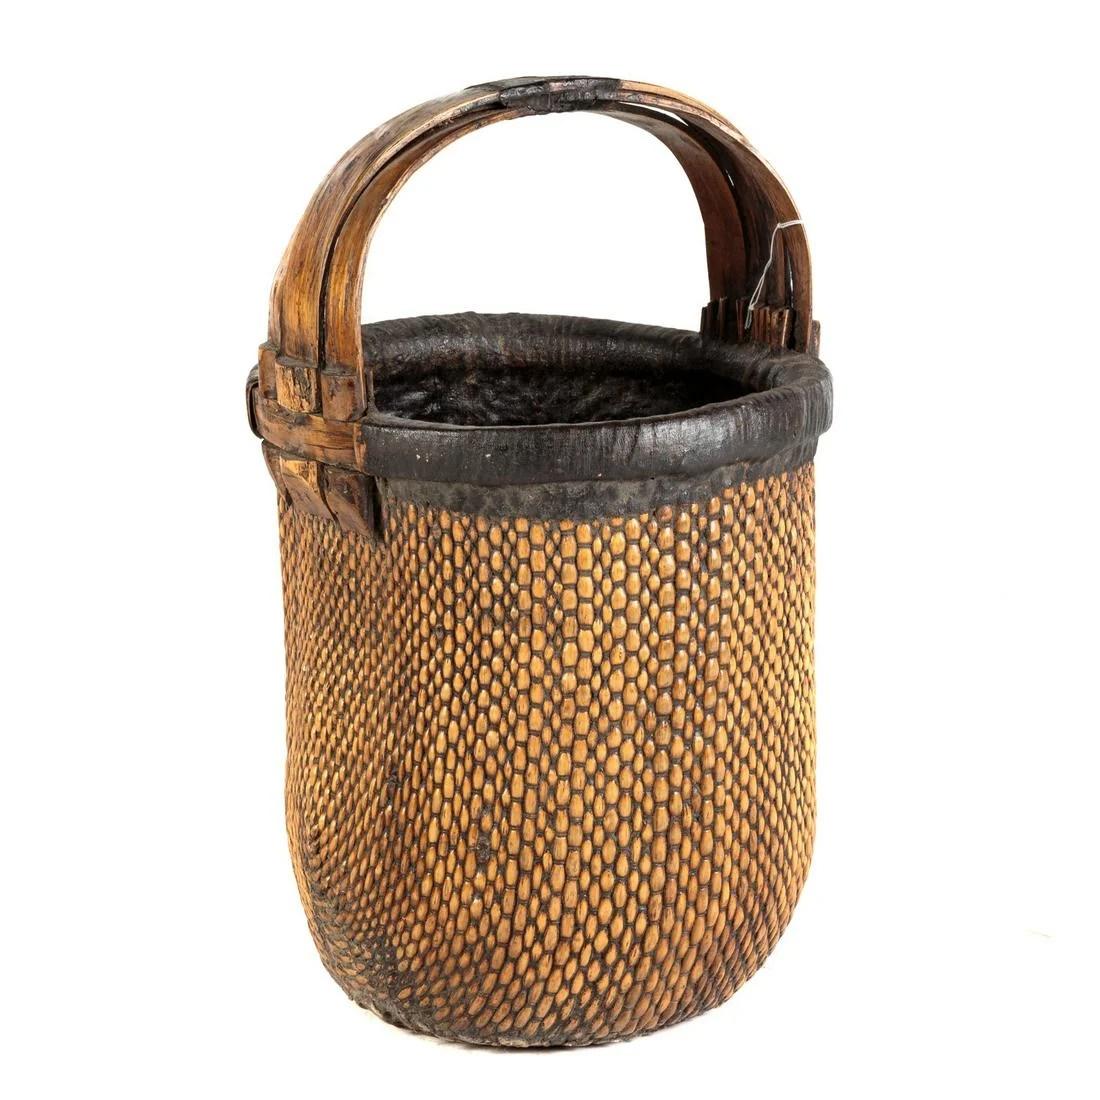 Chinese Woven Bamboo Fisherman's Basket